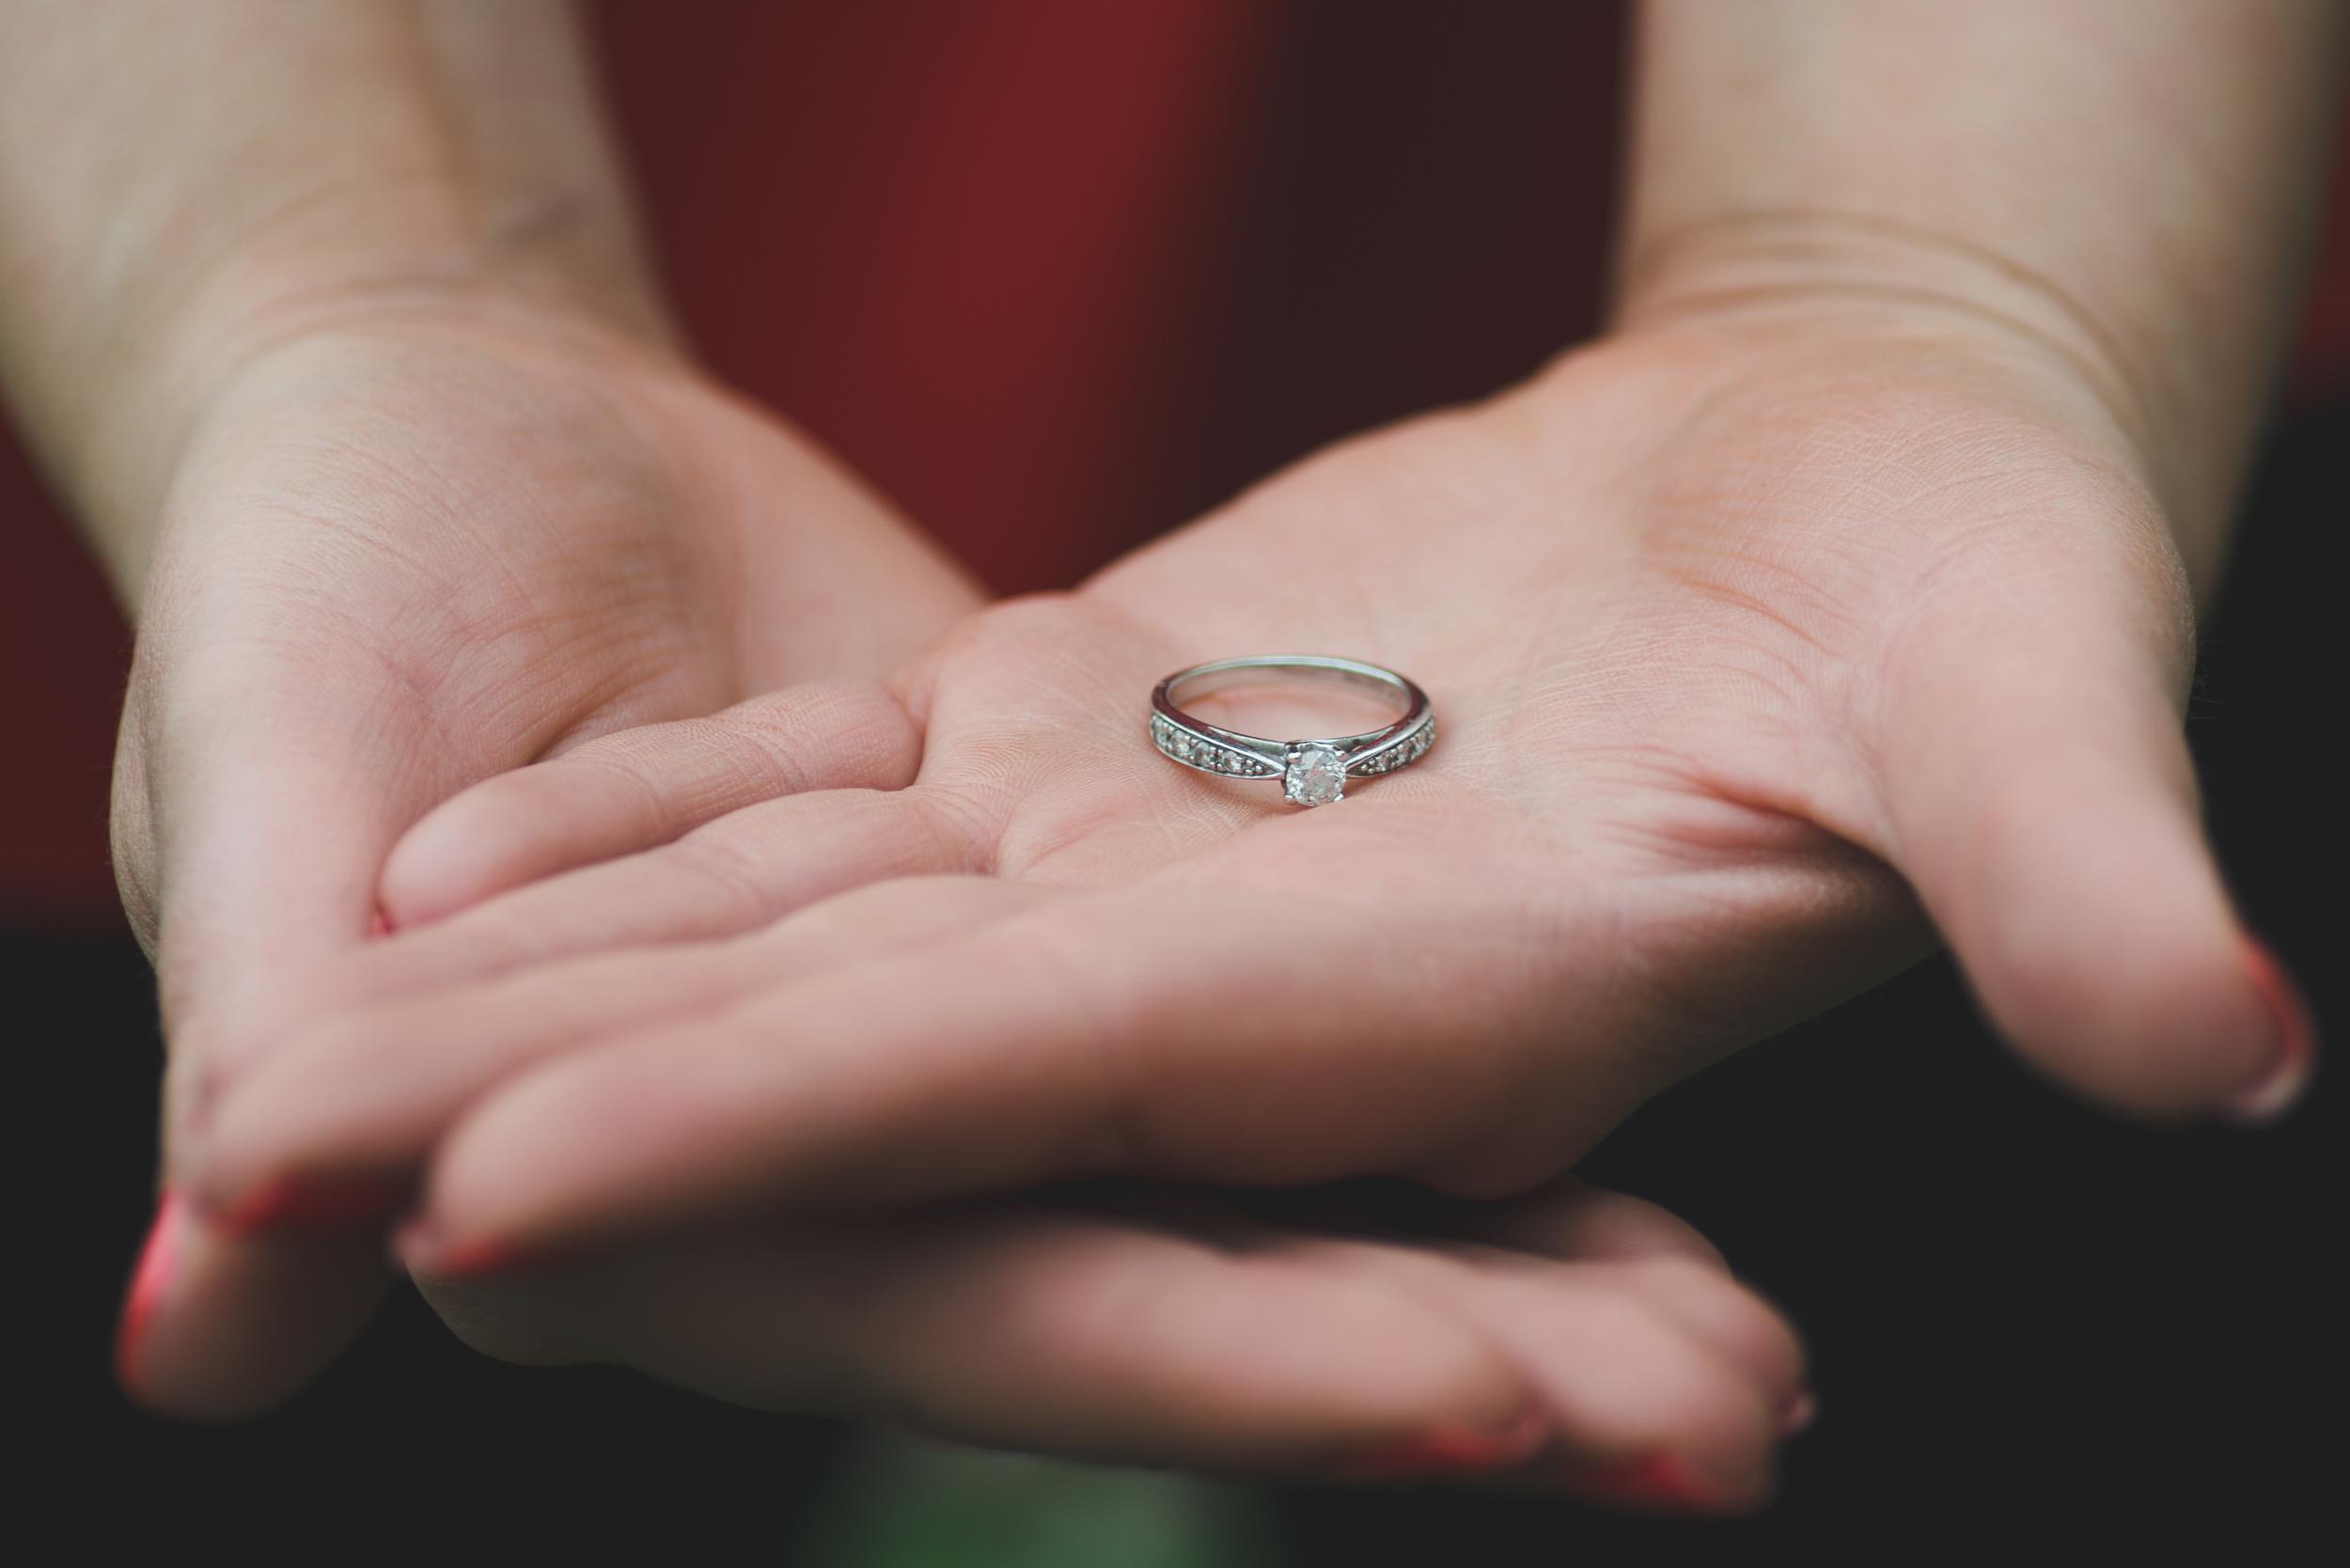 Northern_Ireland_Engagement_Photography_Lady_Dixons_Engagement_Ring